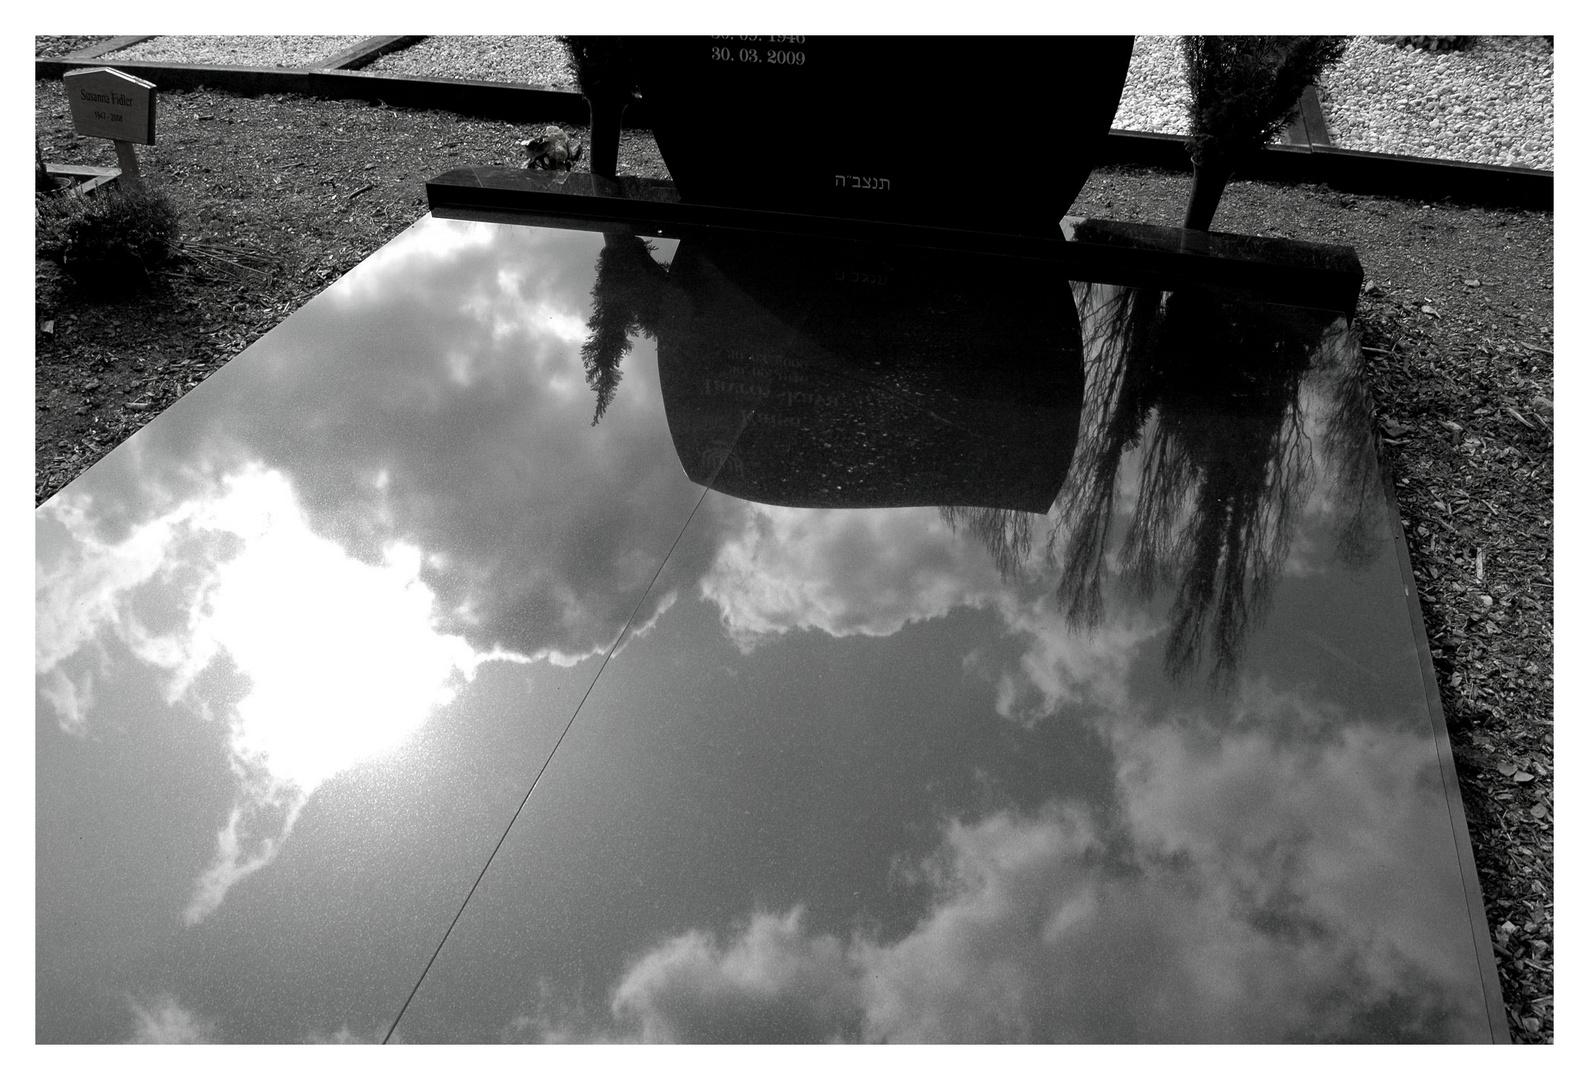 Himmelsspiegelung